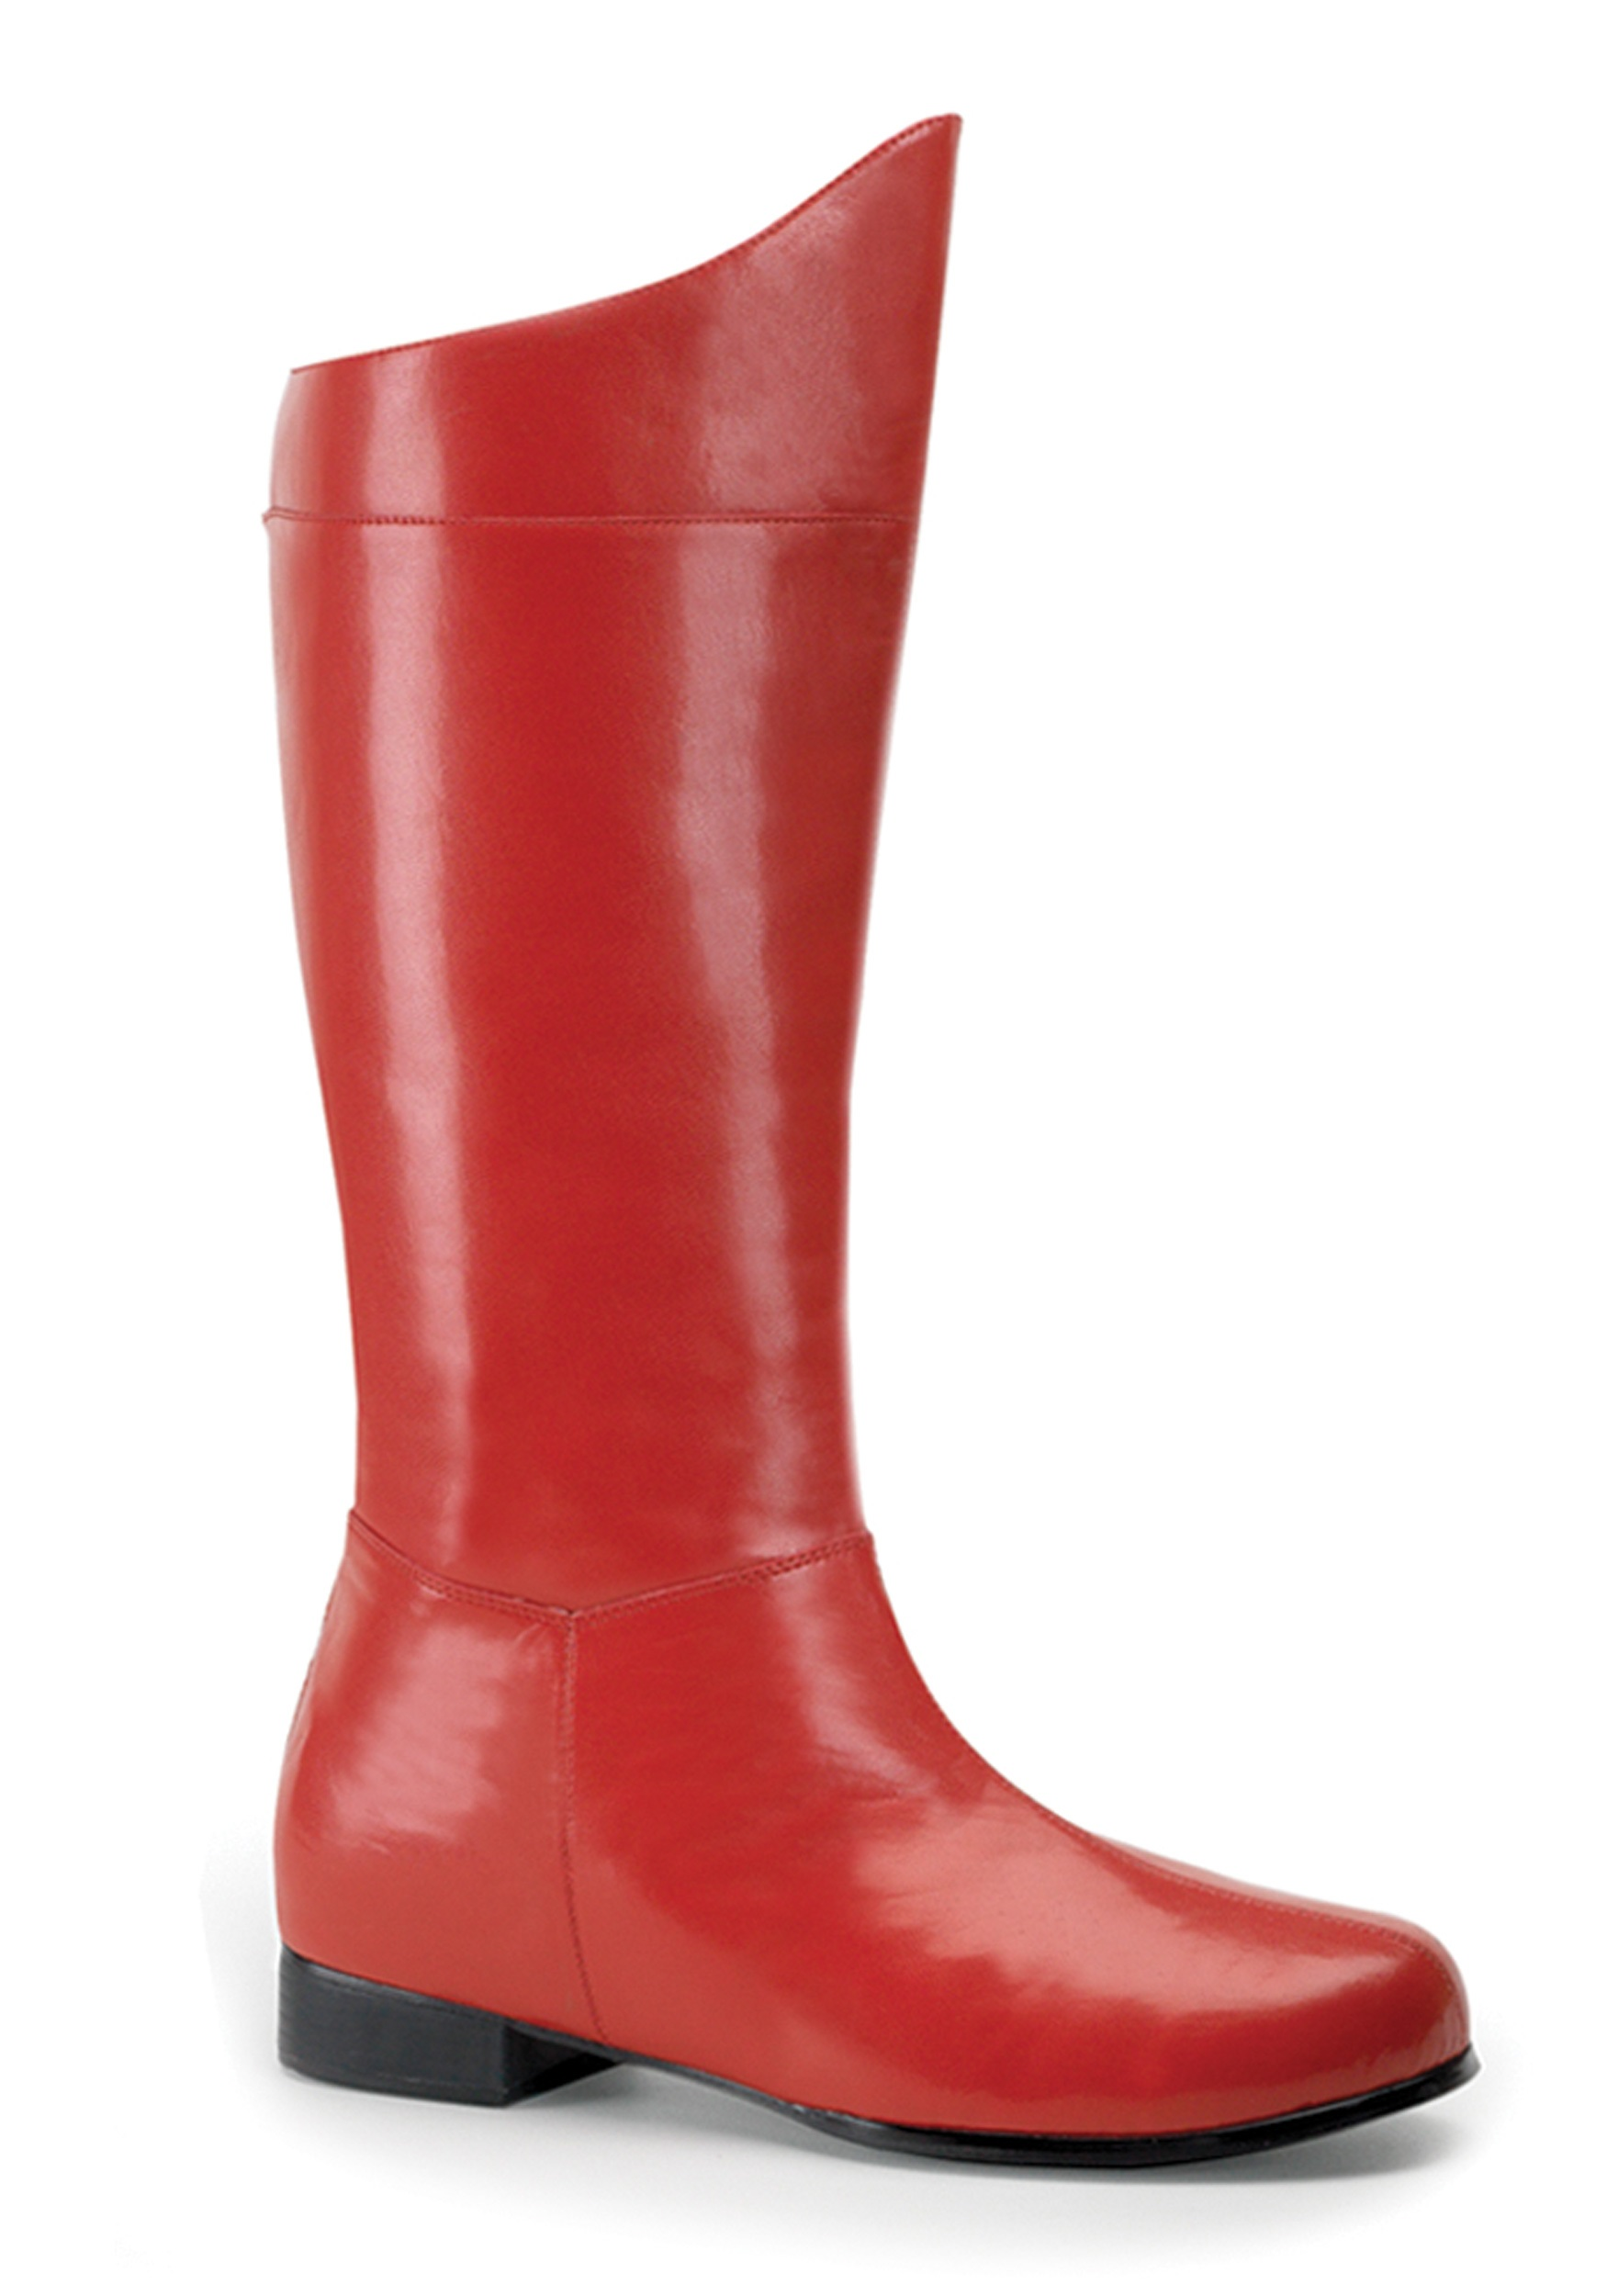 Costume Superhero Boots for Kids